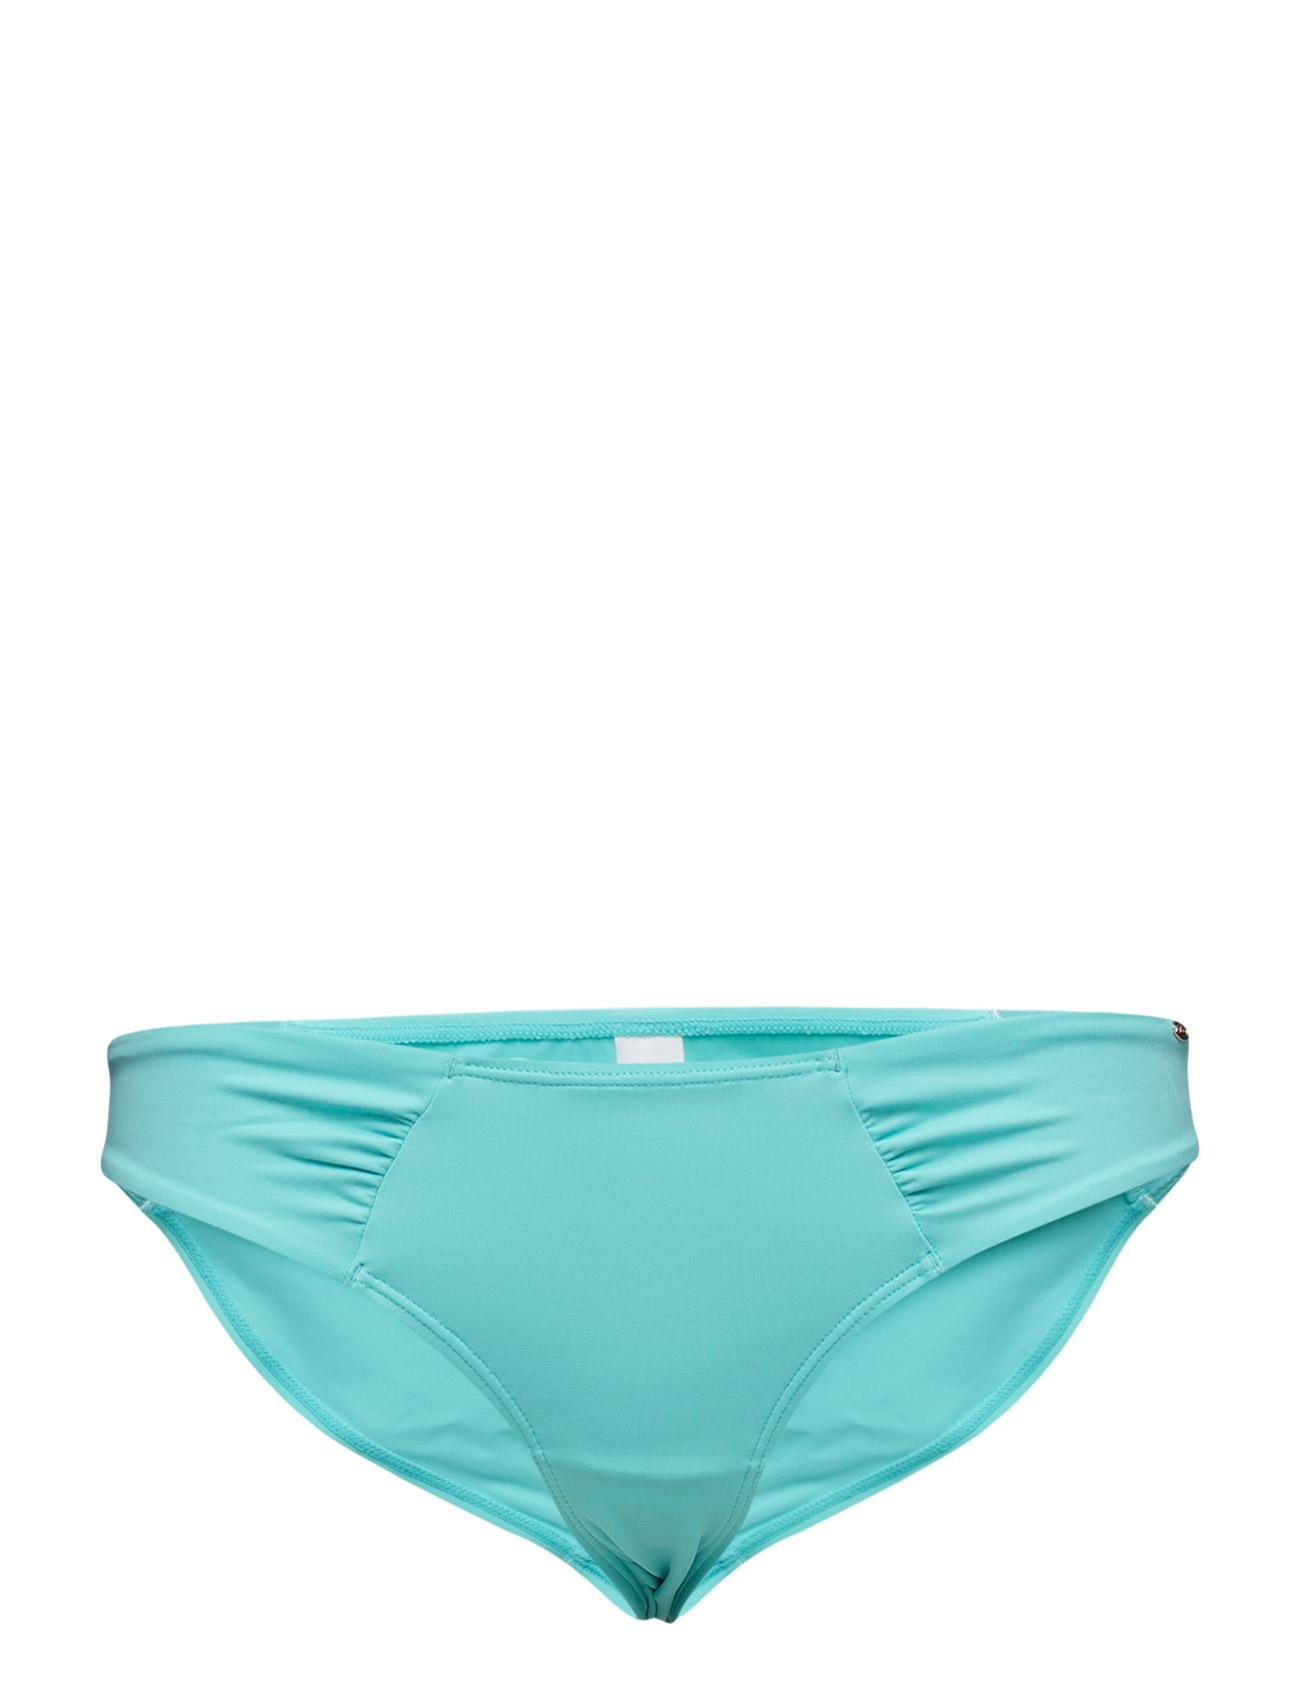 L. Bikini Briefs Skiny Badetøj til Kvinder i